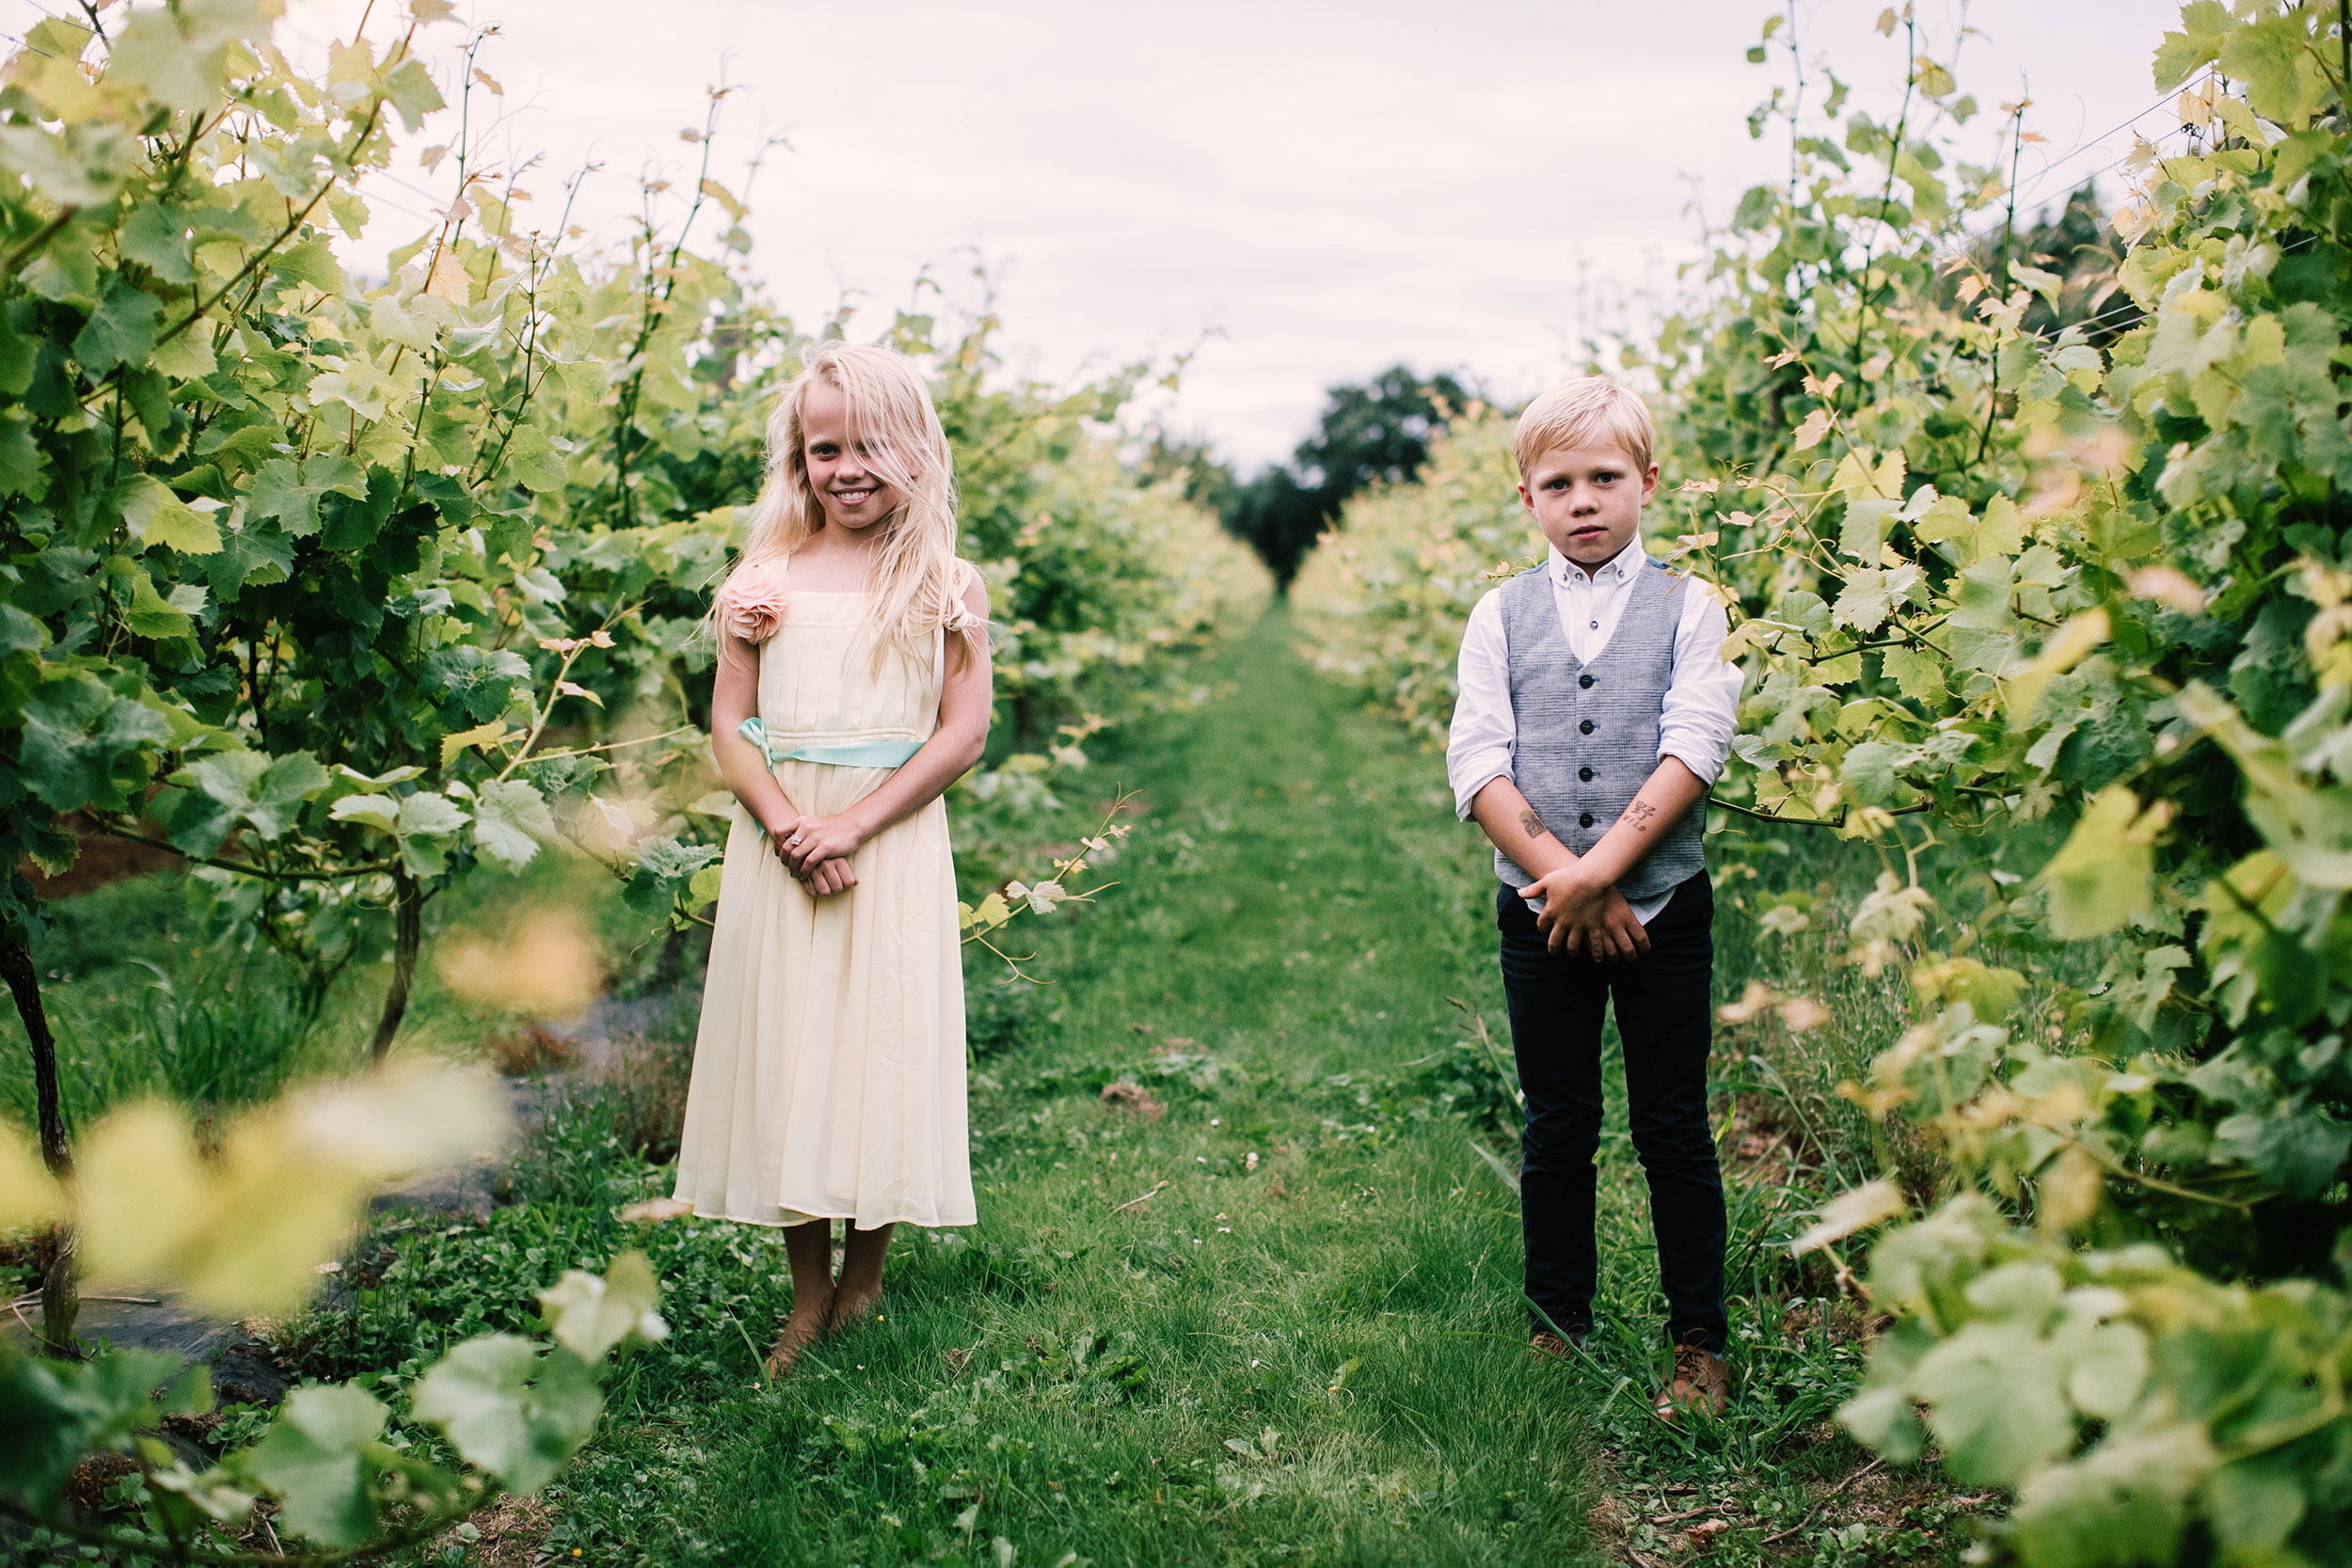 07.29---Wedding-Hayley-&-Gavin_1119_1212.jpg